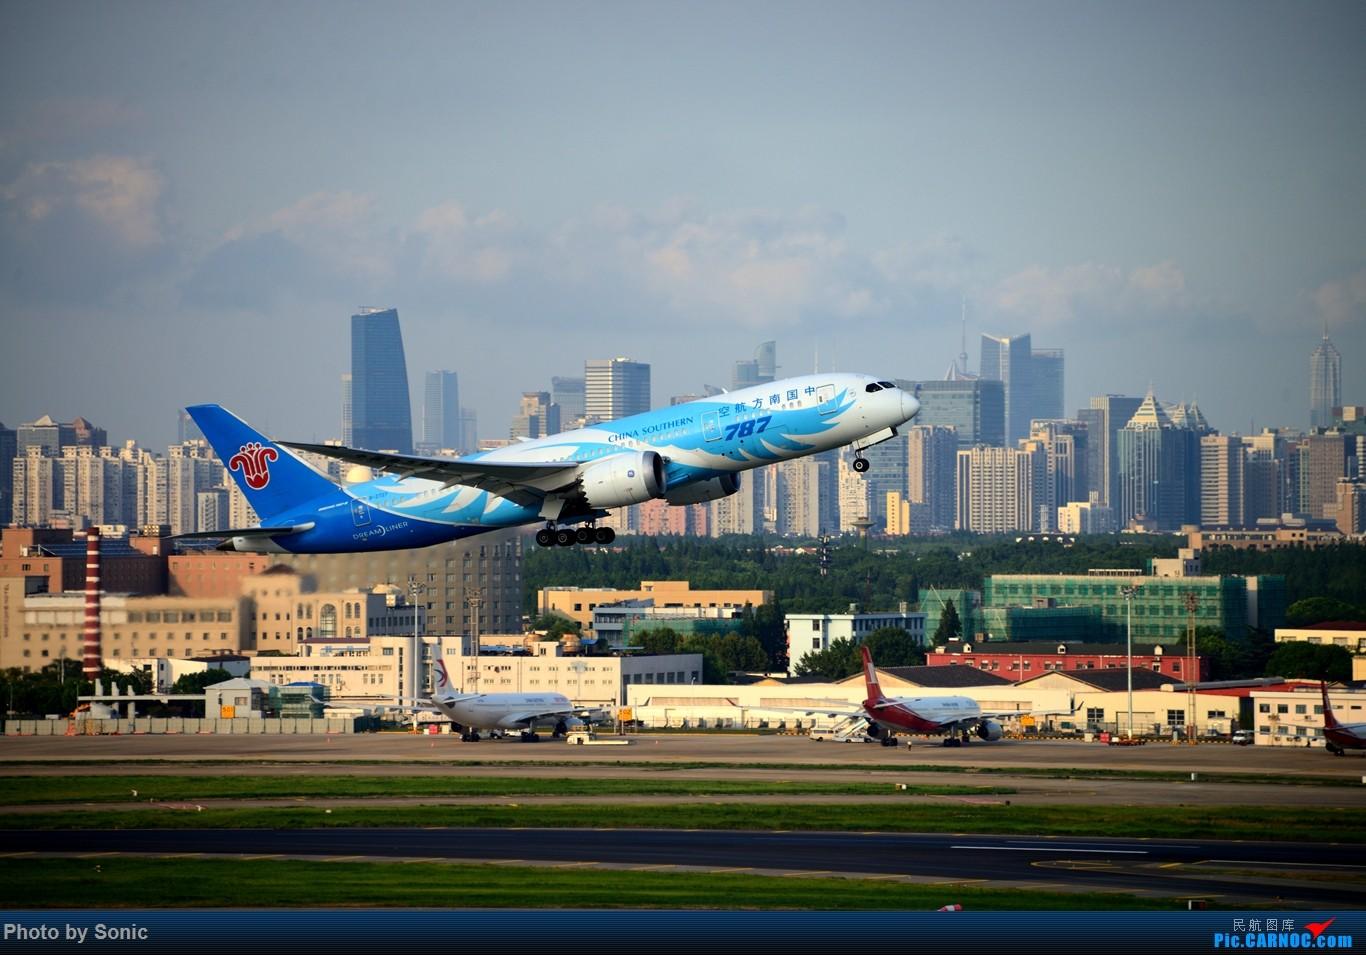 Re:[原创]南航787 虹桥西区 BOEING 787-8 B-2727 中国上海虹桥国际机场